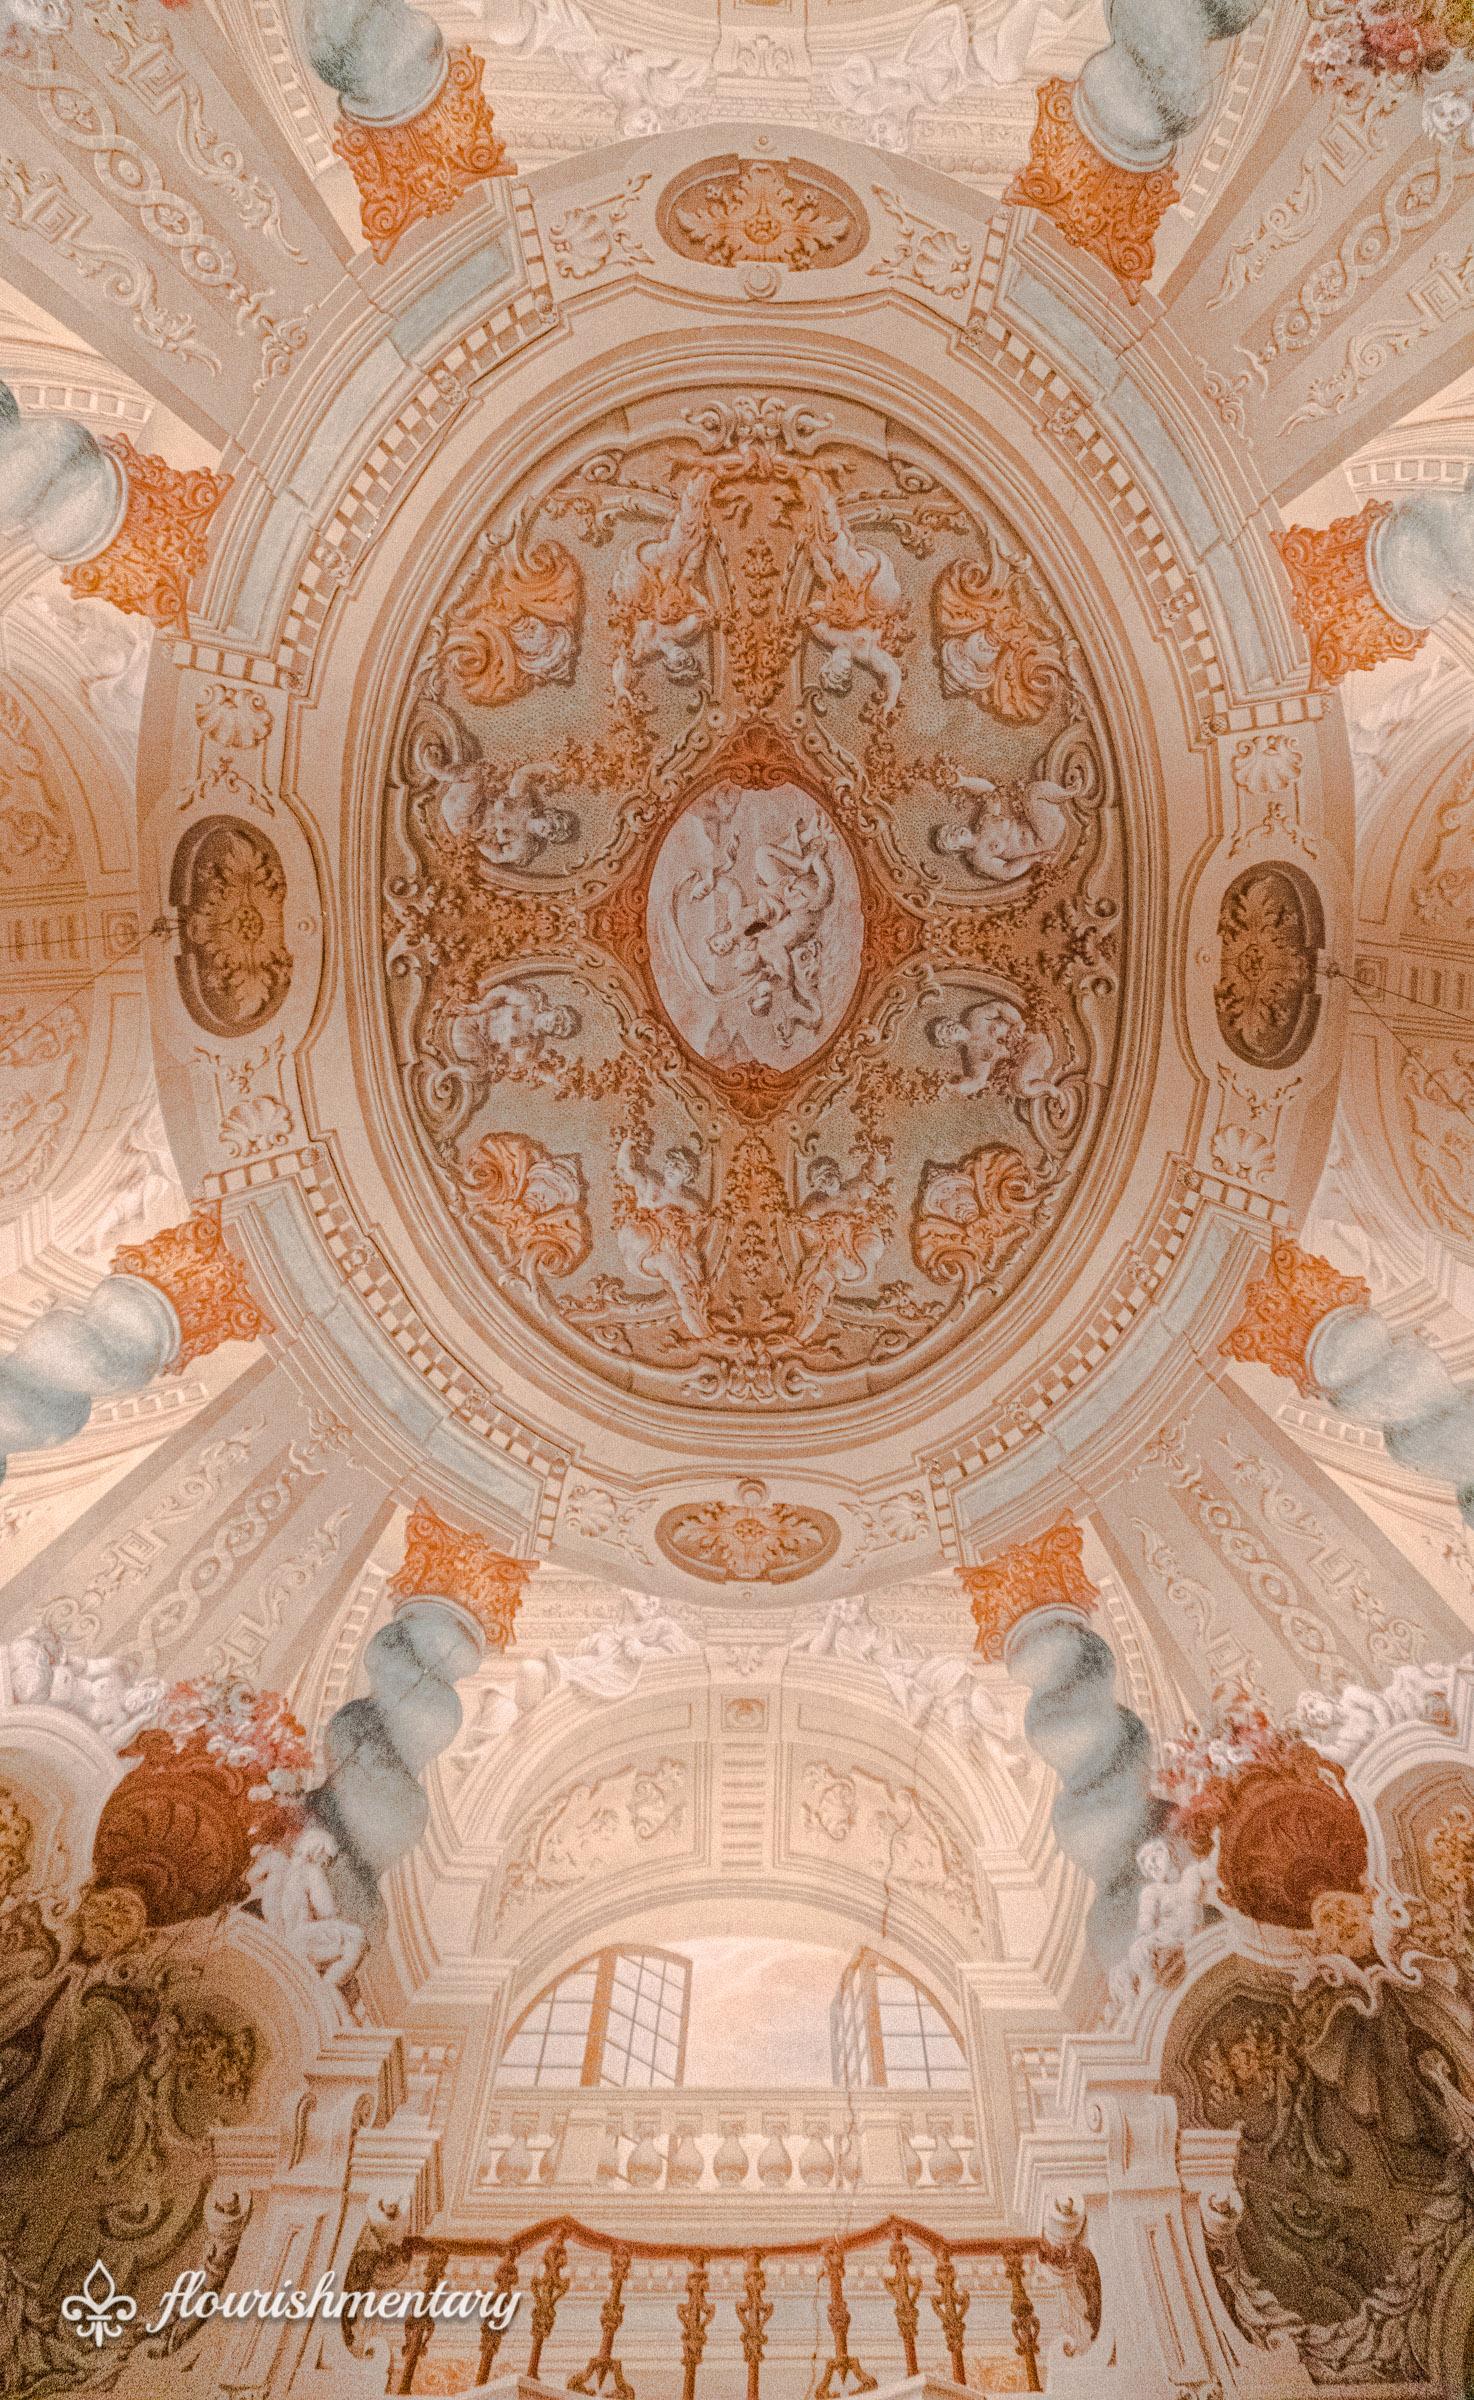 Galleria Doria Pamphilj fresco